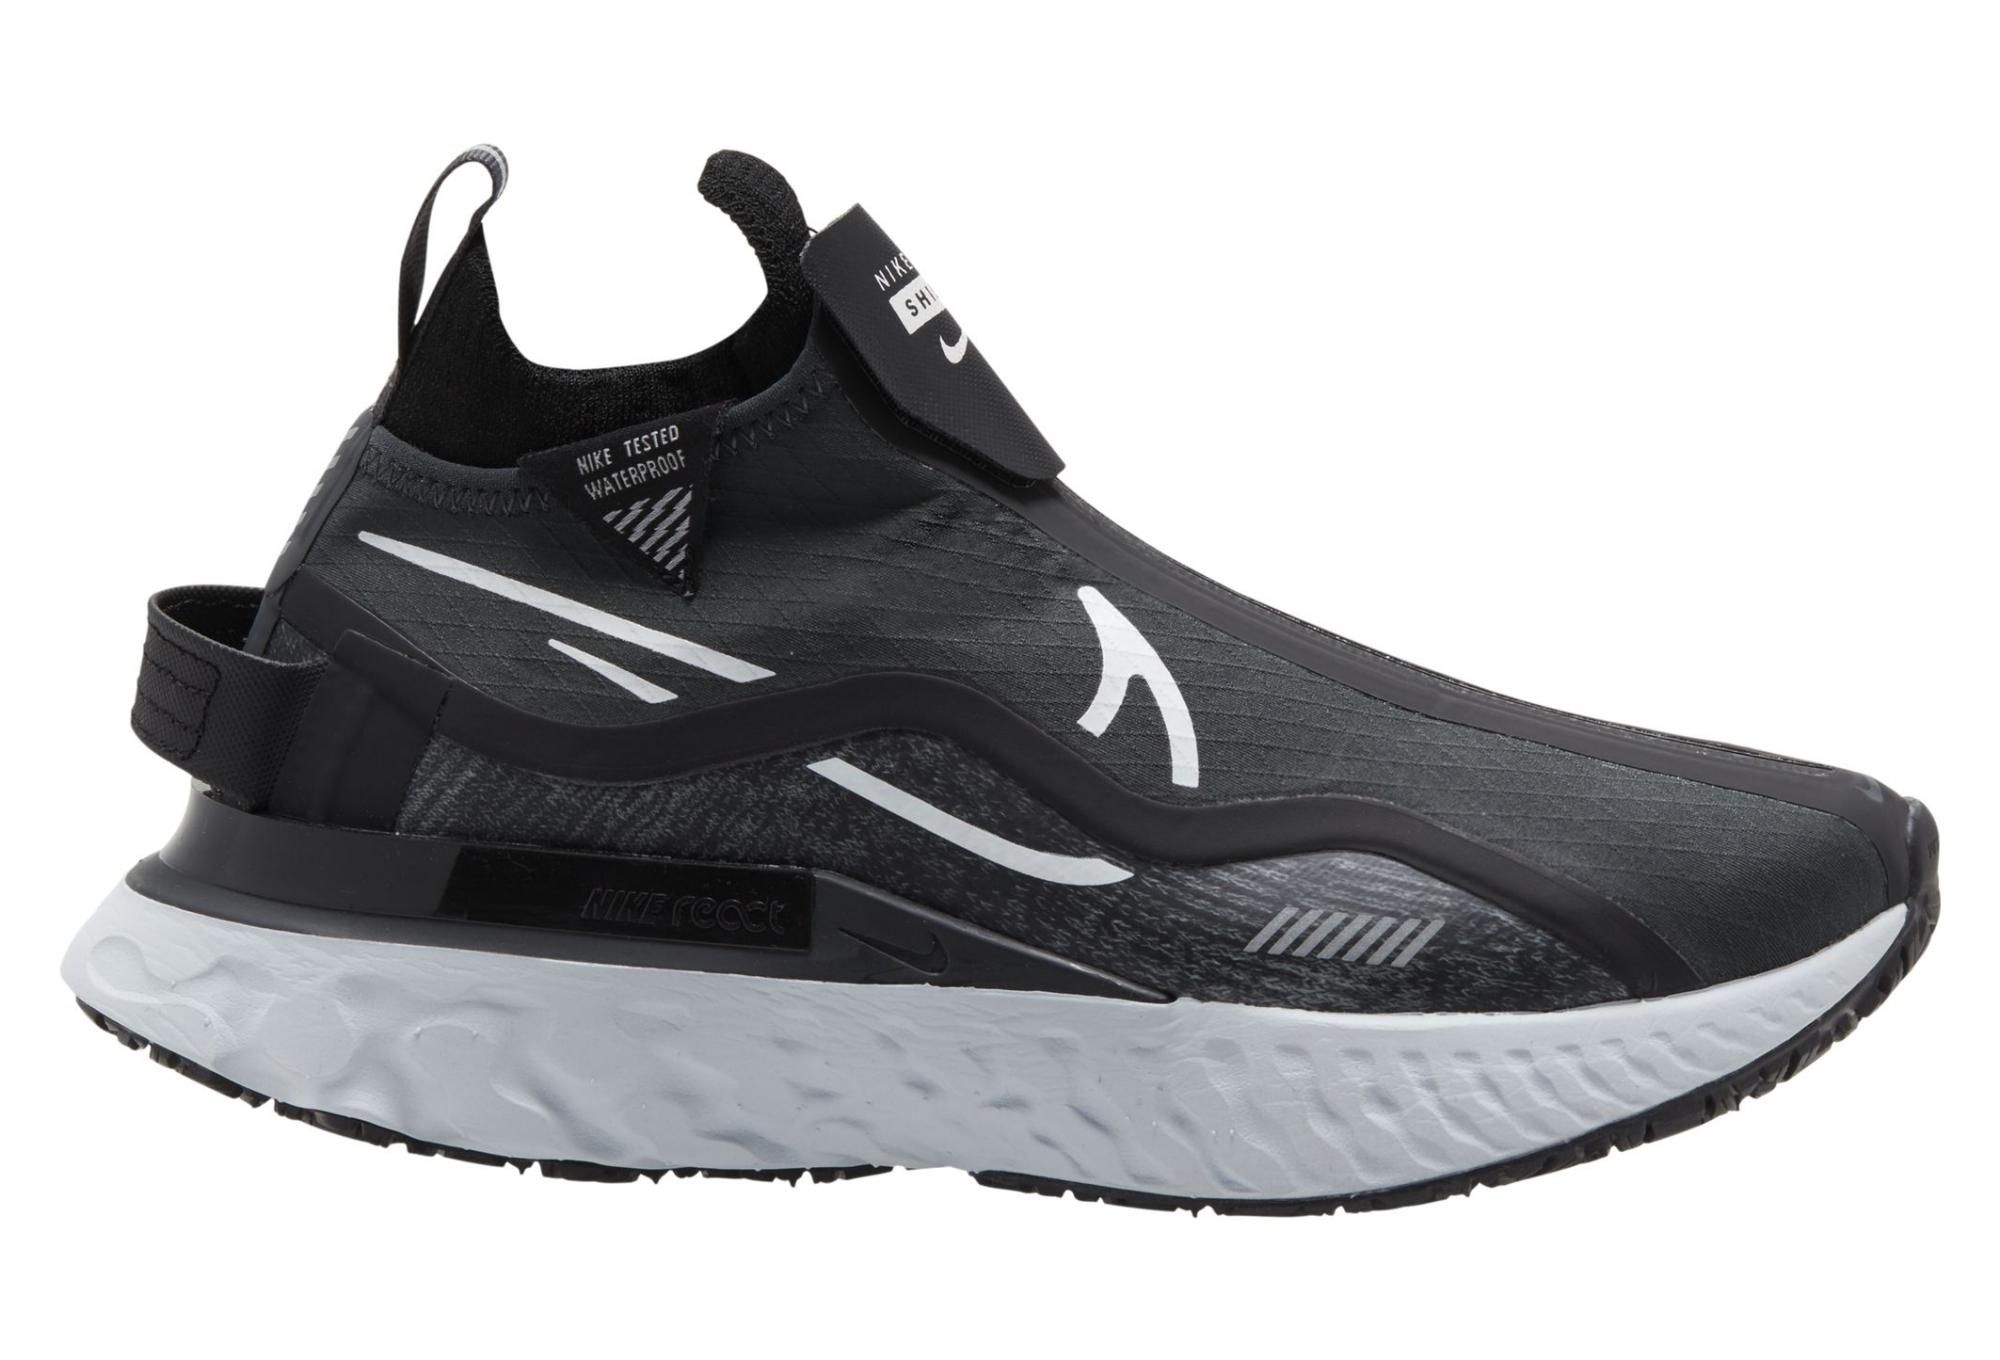 Novela de suspenso Multitud silencio  Nike React Infinity Run Flyknit Shield Negro Blanco Mujer Running Zapatos |  Alltricks.es